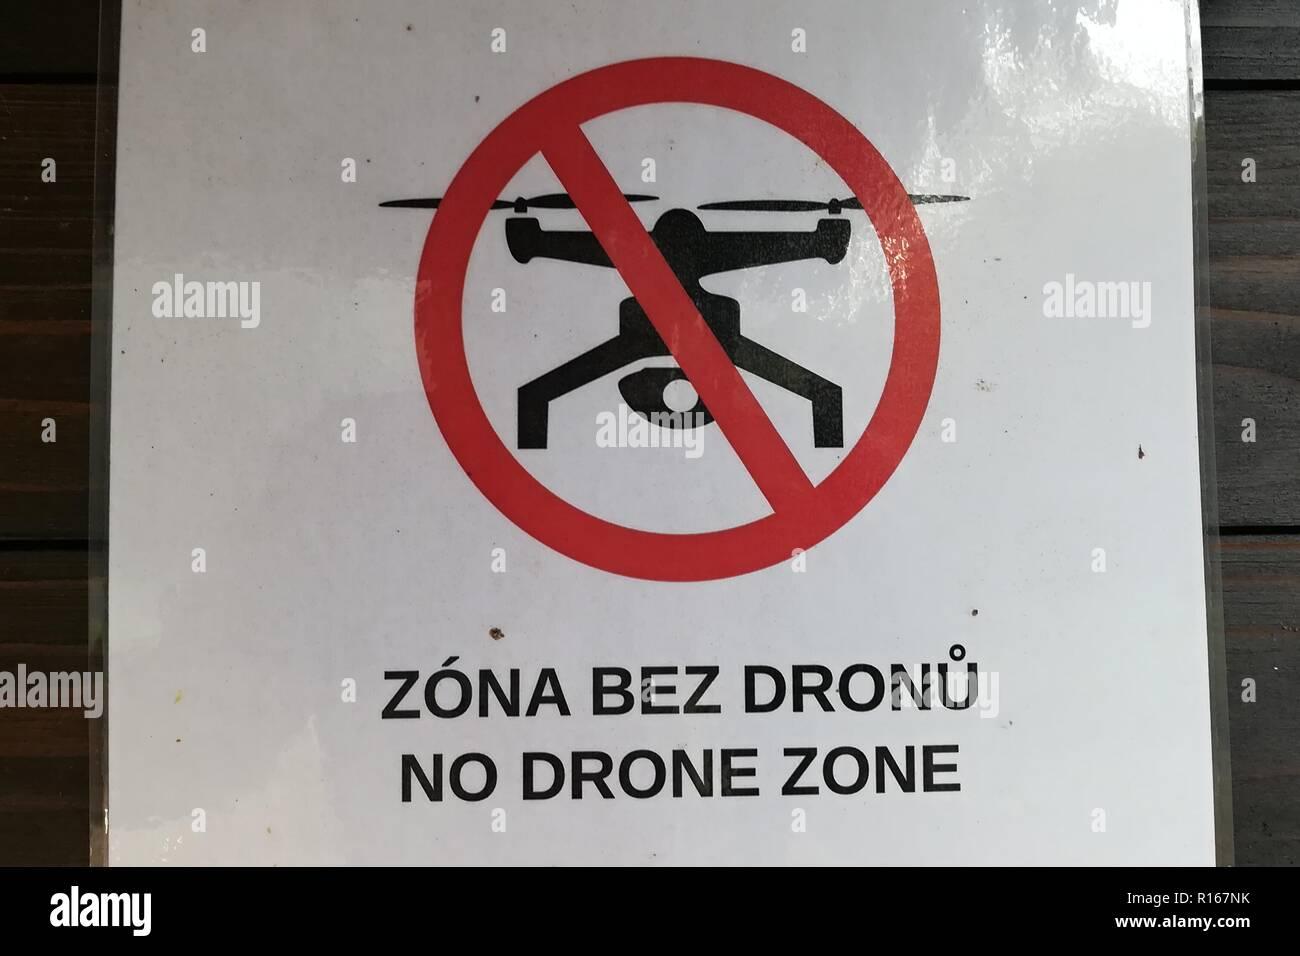 No drone zone sign in Jetrichovice, Czech Republic, November 7, 2018. (CTK Photo/Marek Spilka) - Stock Image